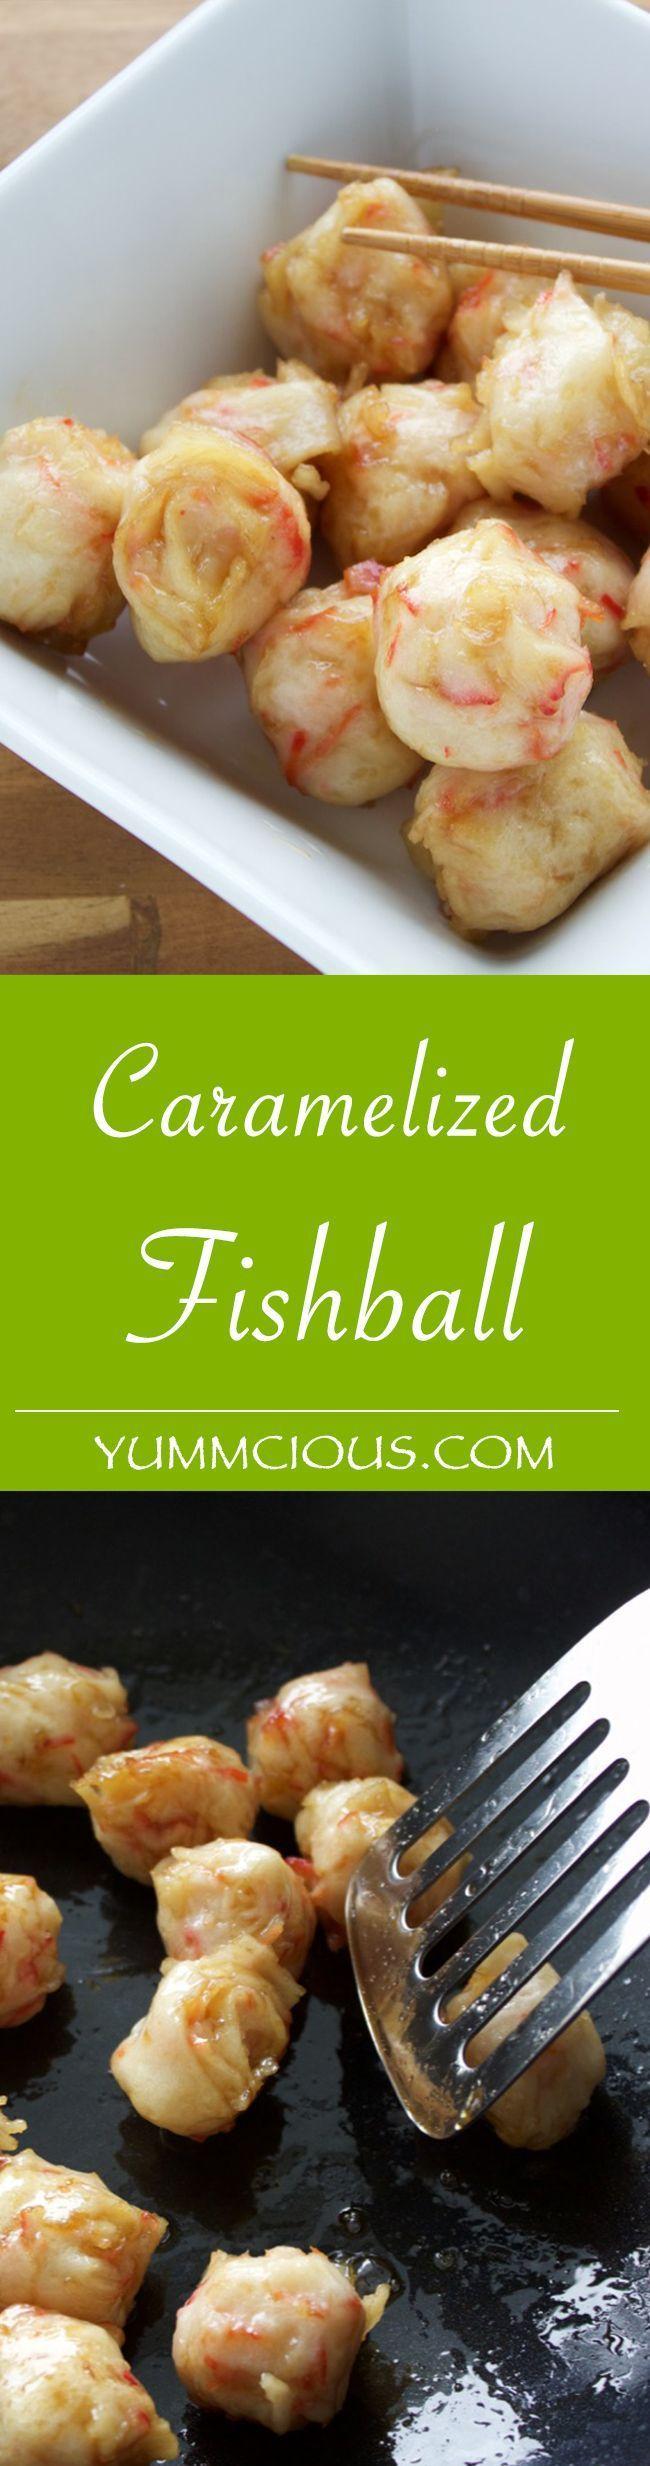 Caramelized Fishball  http://yummcious.com/fish-ball-recipe/